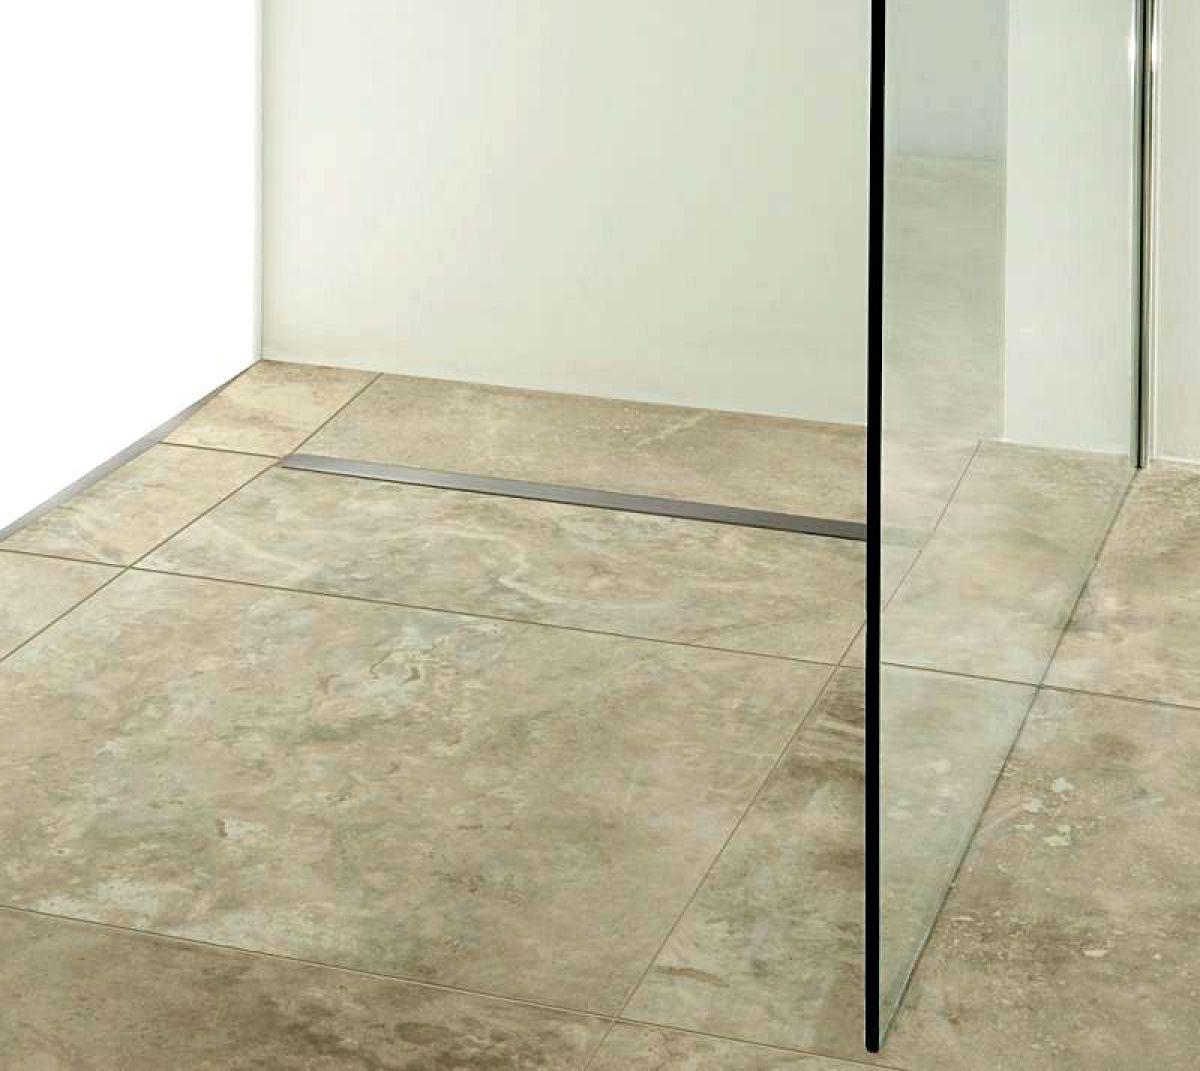 Impey Aqua Dec Linear 2 Wetroom System Bathrooms Direct